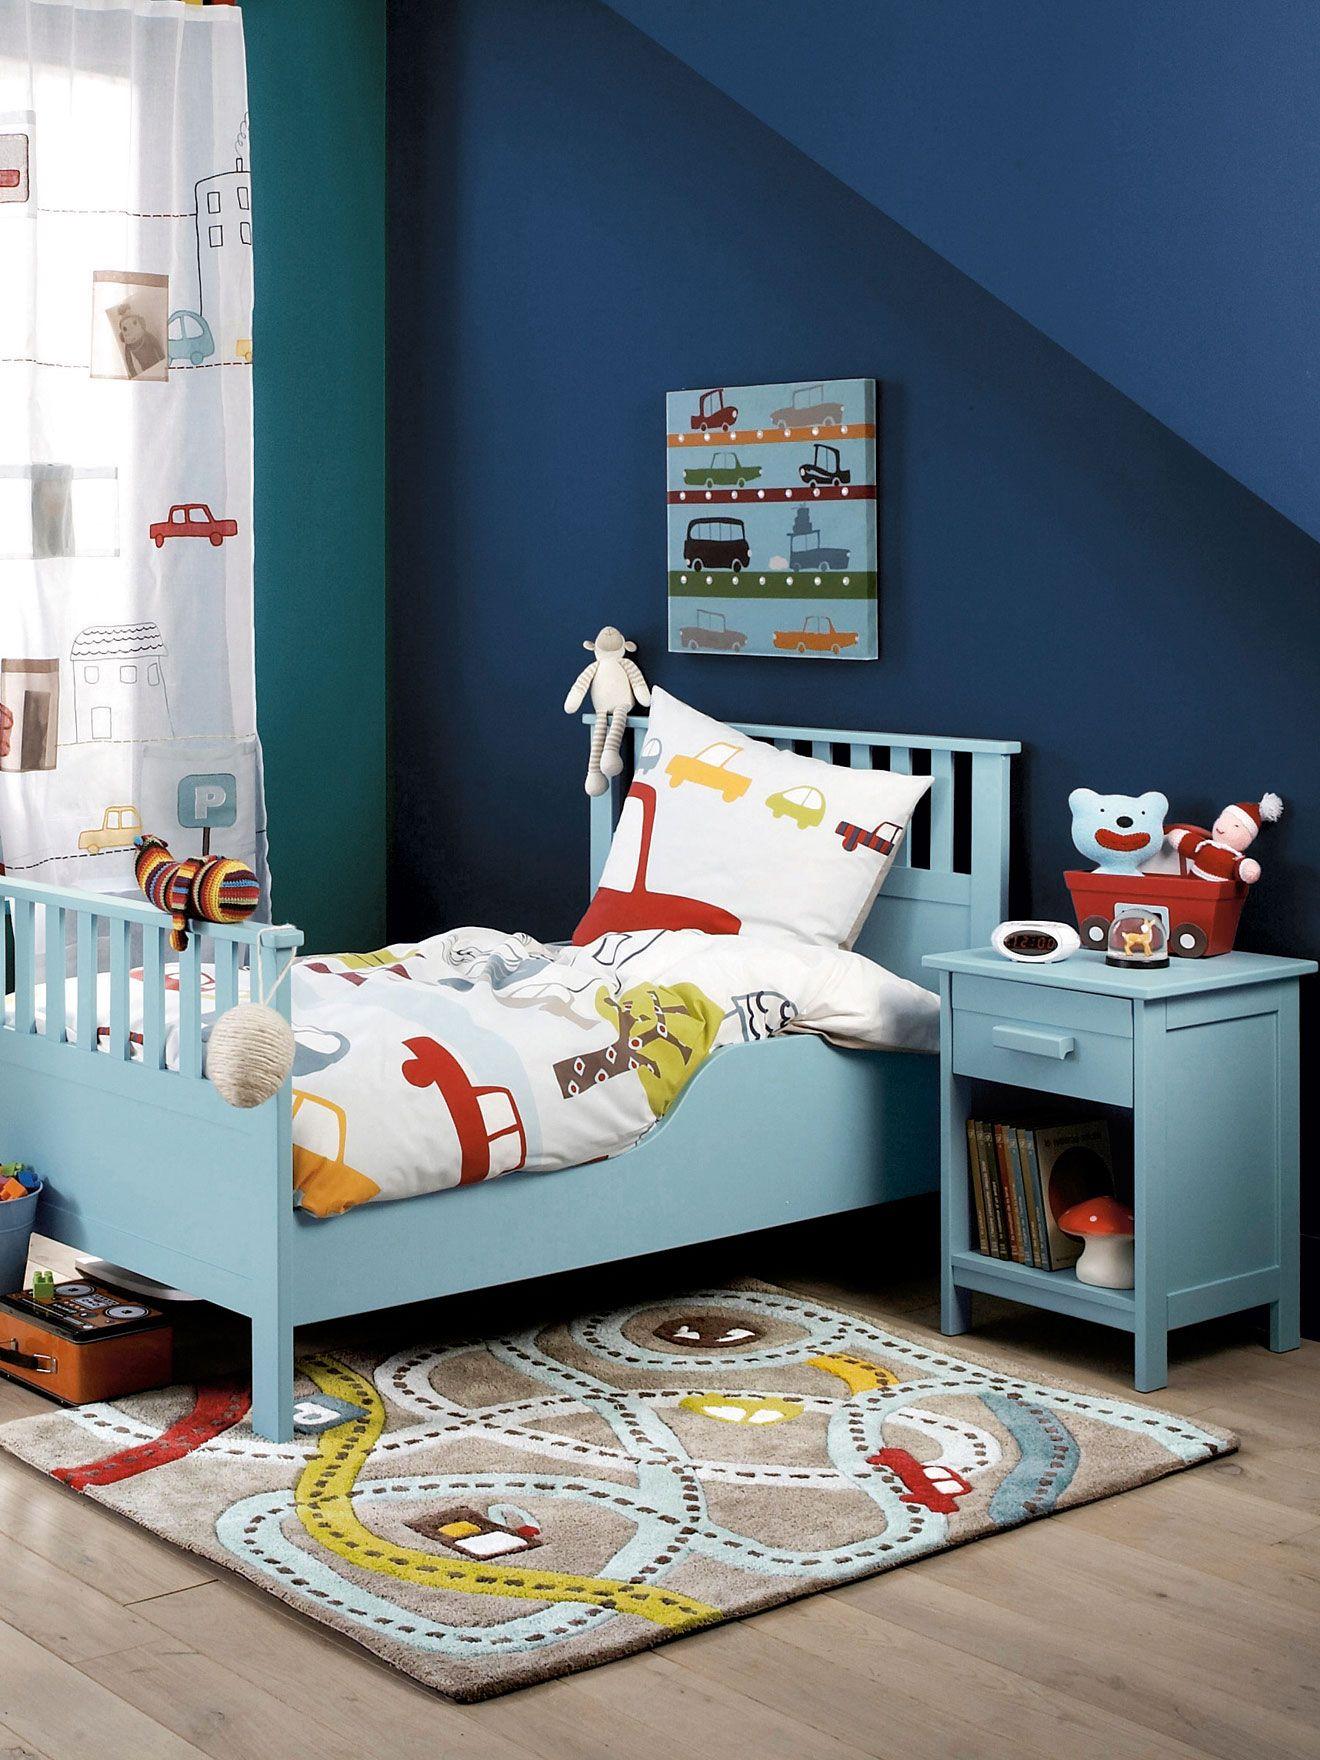 Toddler boy truck bedroom ideas - Room Update For P